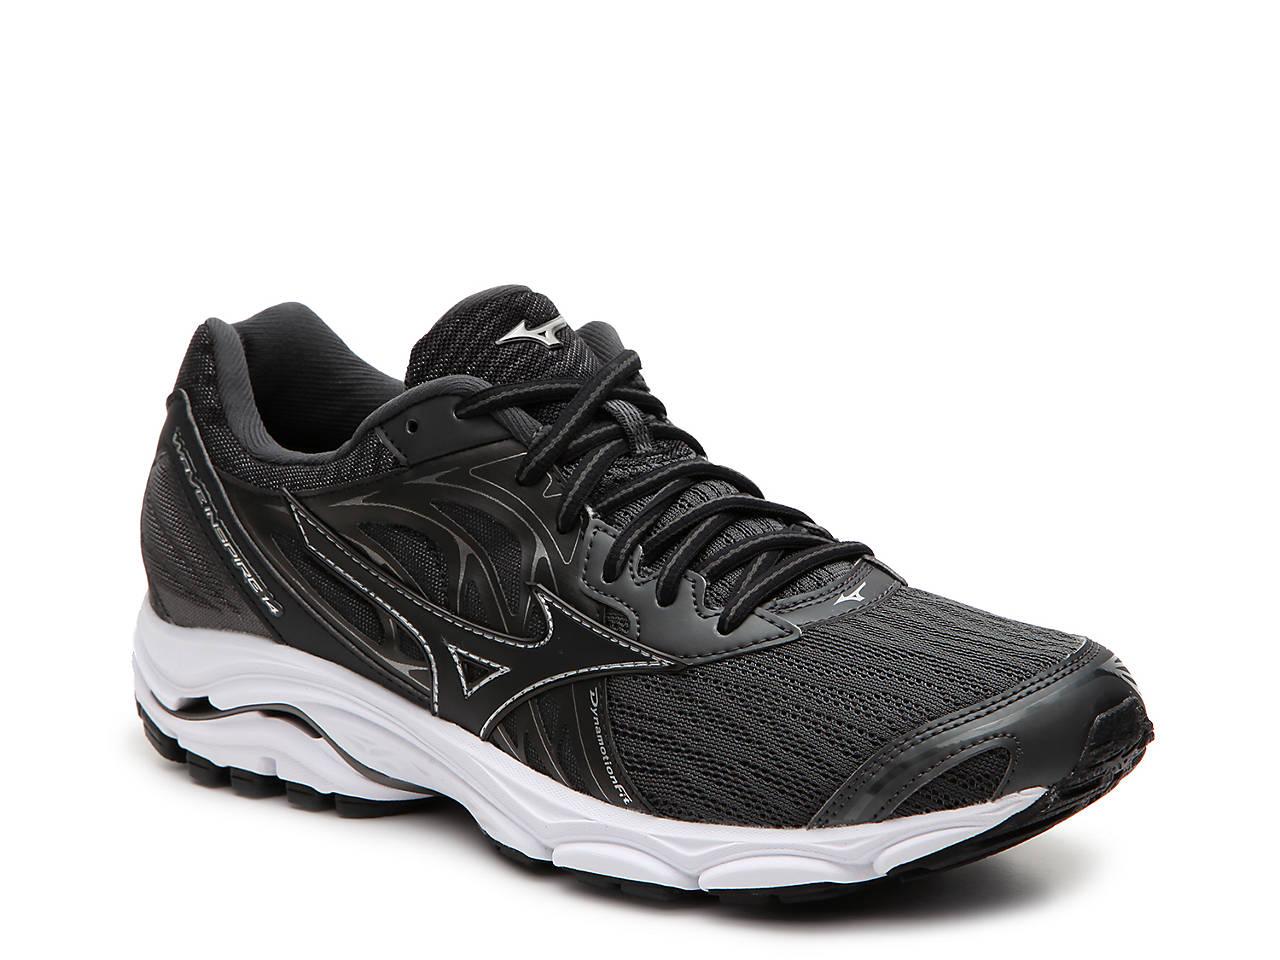 Mizuno Wave Inspire 14 Performance Running Shoe - Men s Men s Shoes ... 3e7e9d24e29b